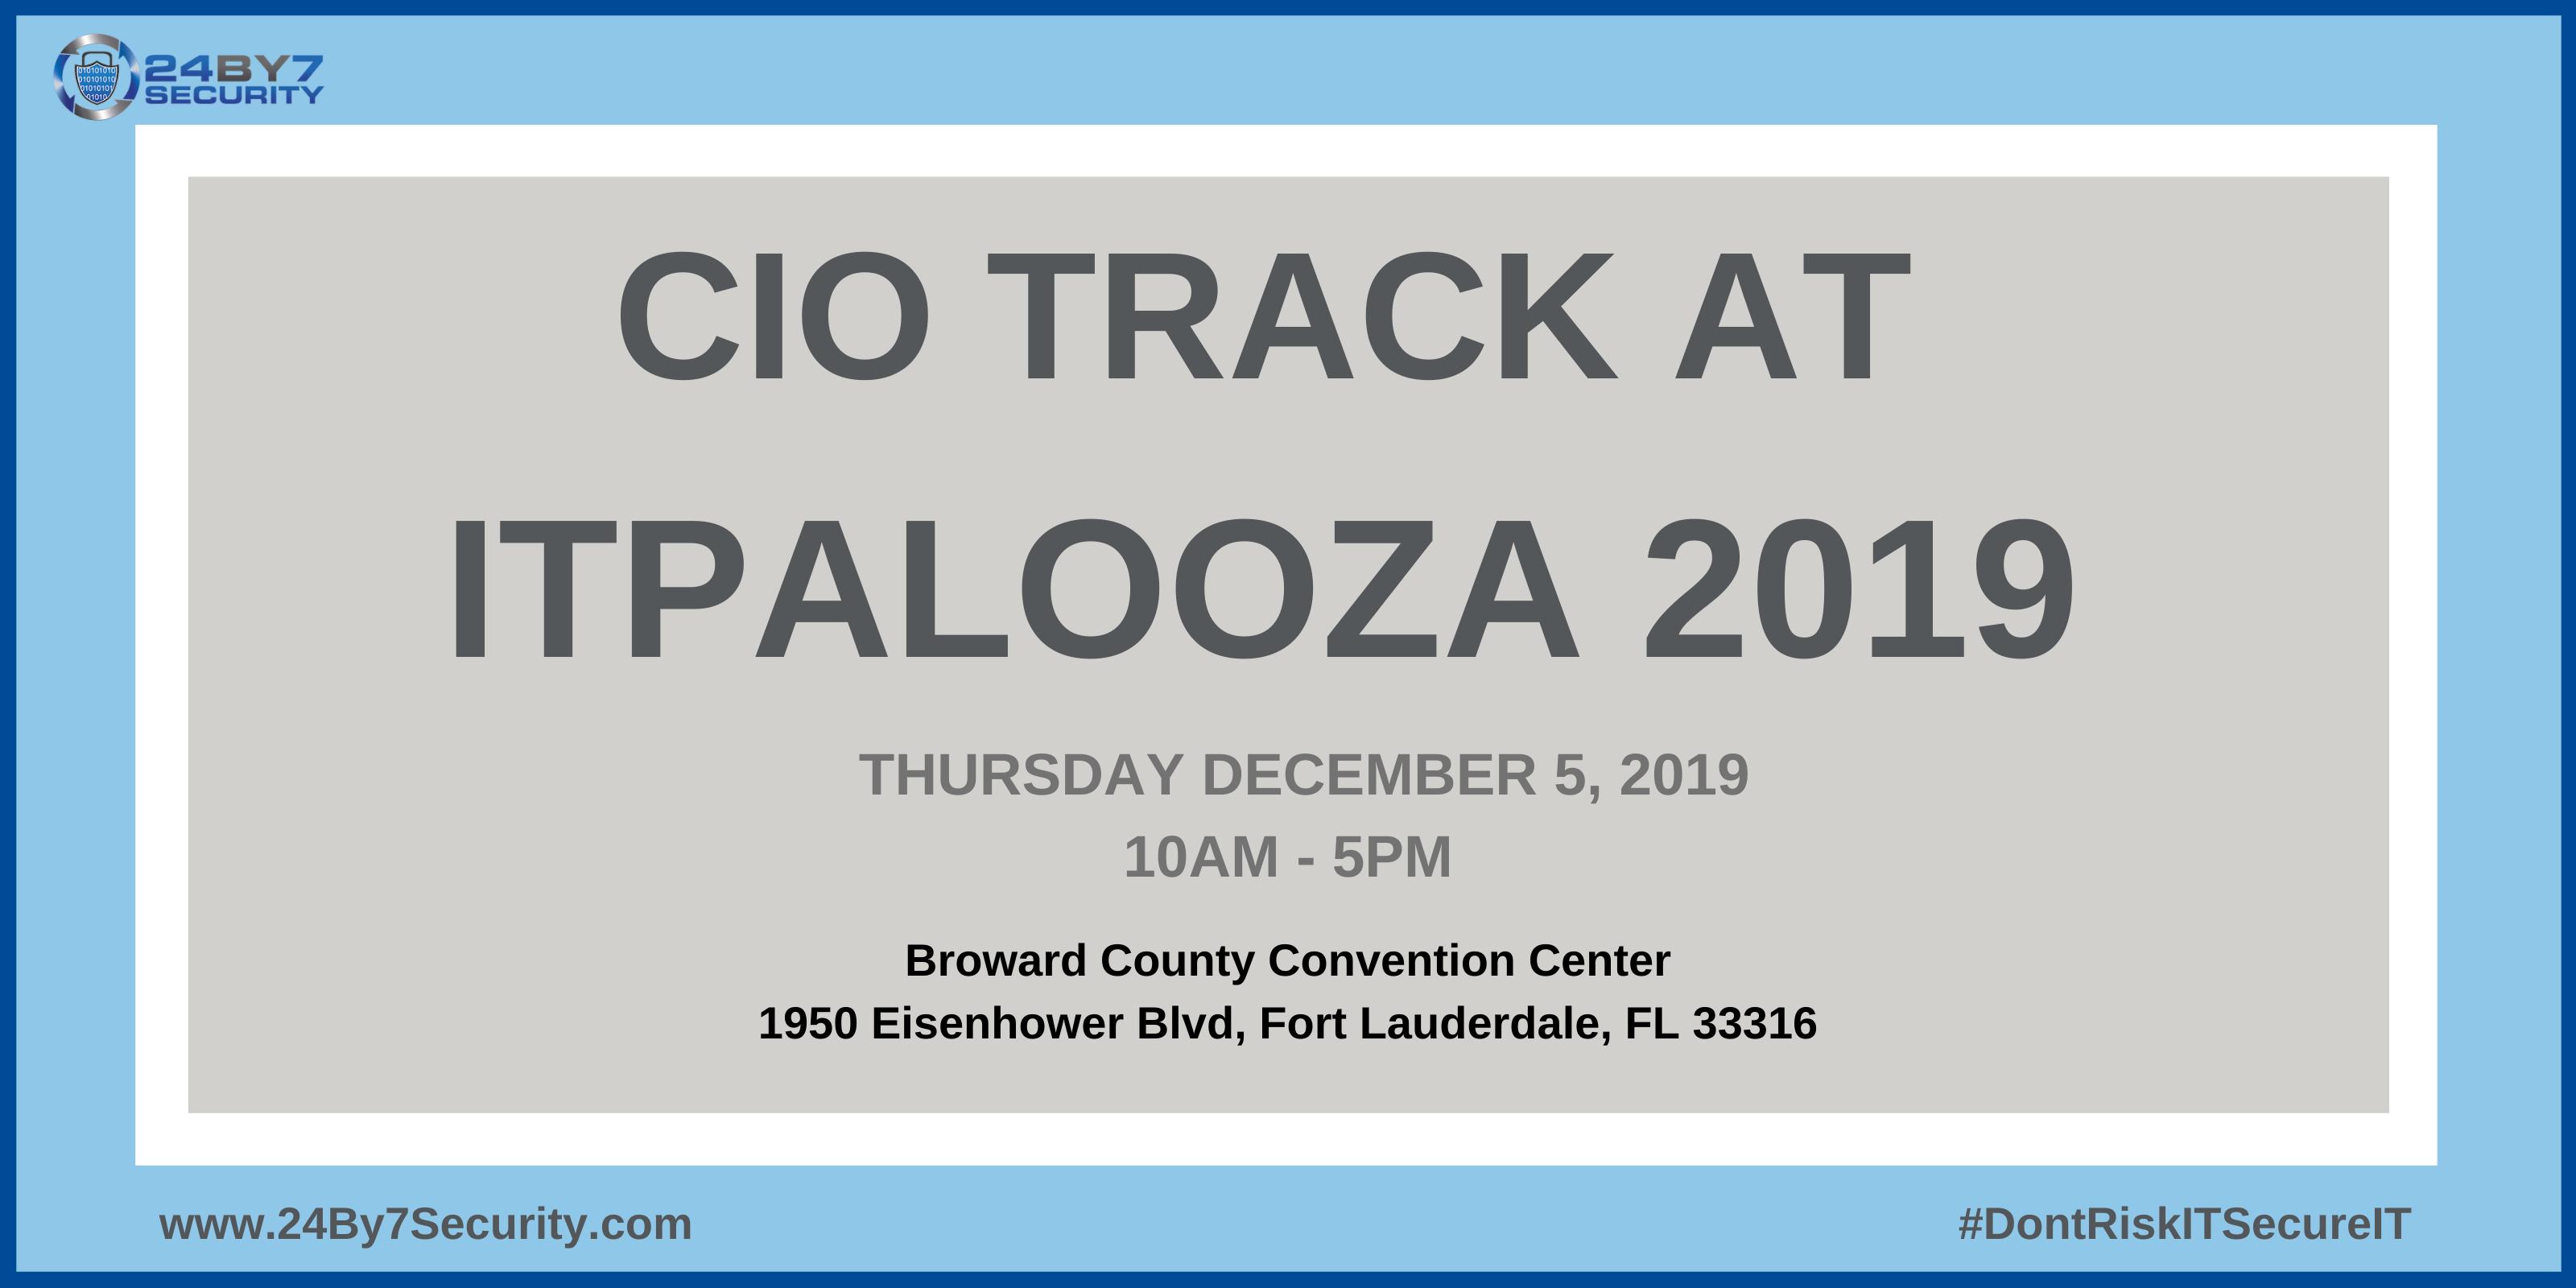 ITPalooza Event